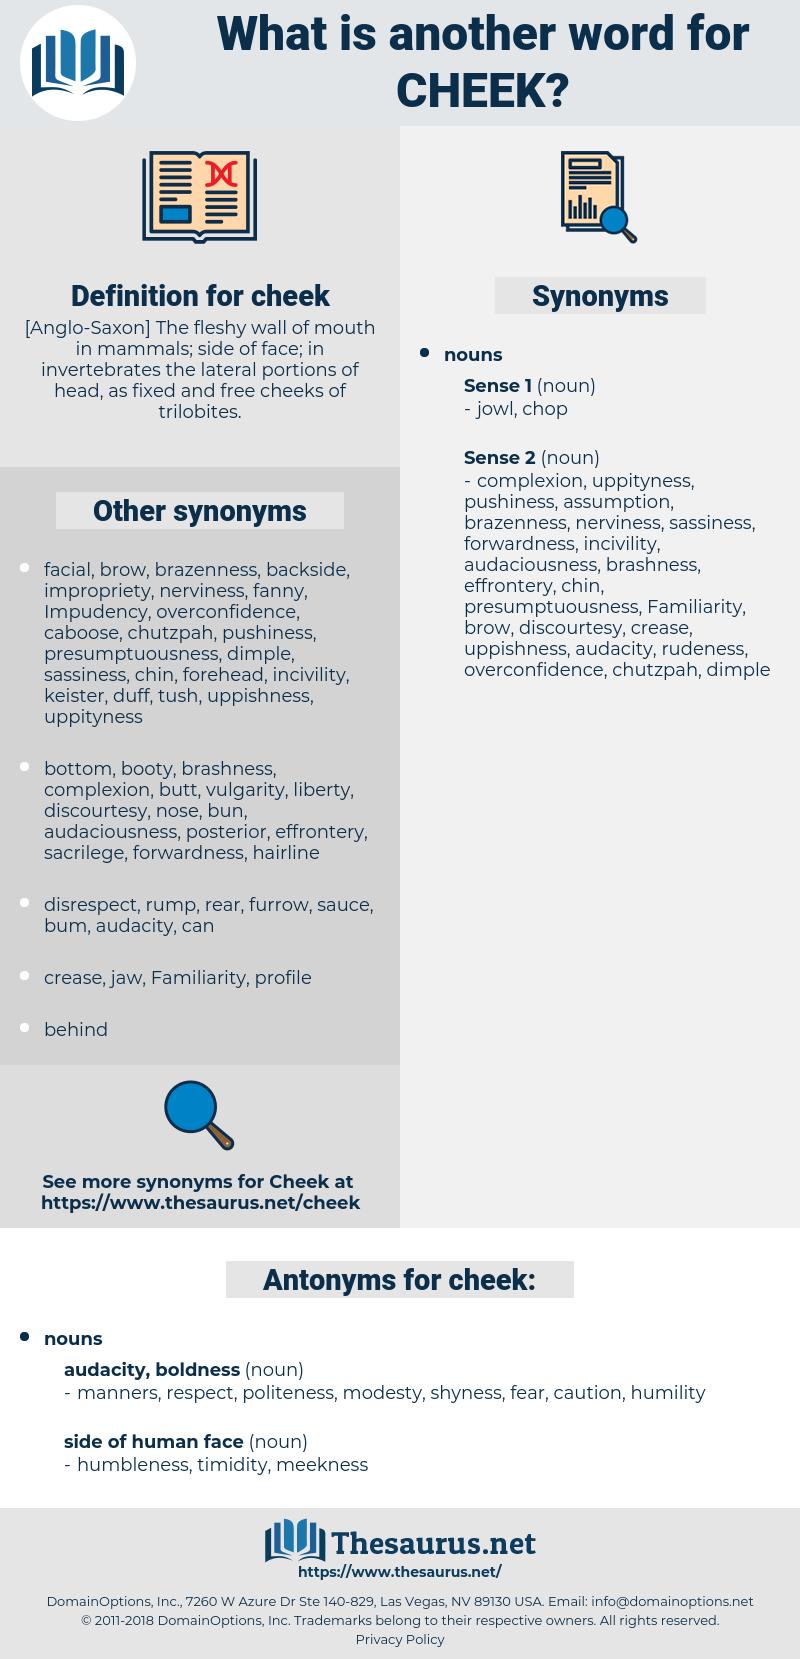 cheek, synonym cheek, another word for cheek, words like cheek, thesaurus cheek